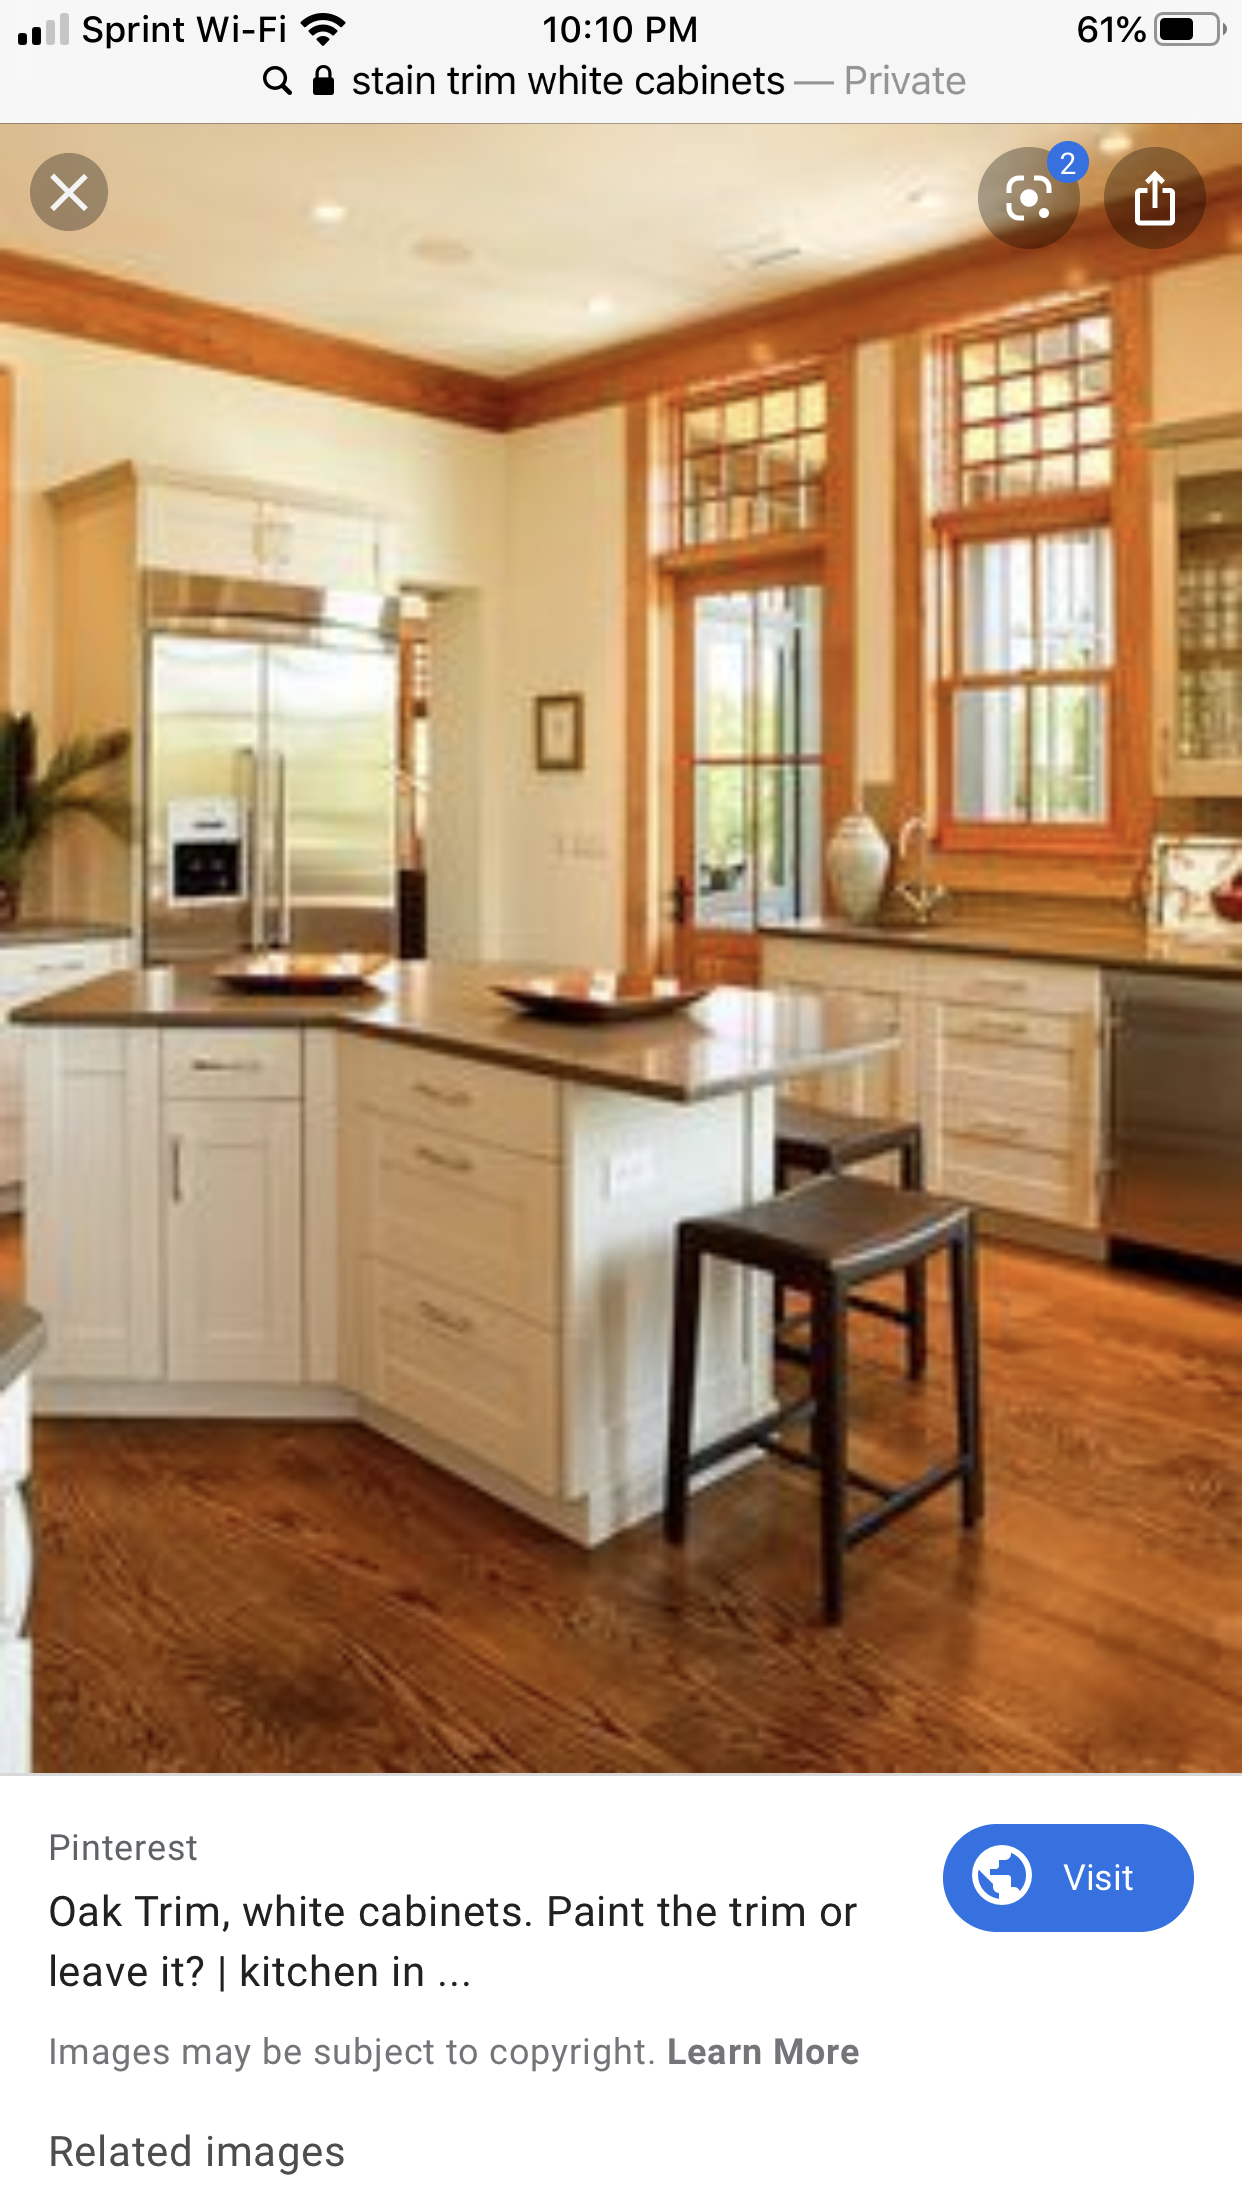 Pin By Lacie Myszak On Home Kitchen In 2020 White Kitchen Oak Trim Vintage Kitchen Cabinets Crown Molding Kitchen